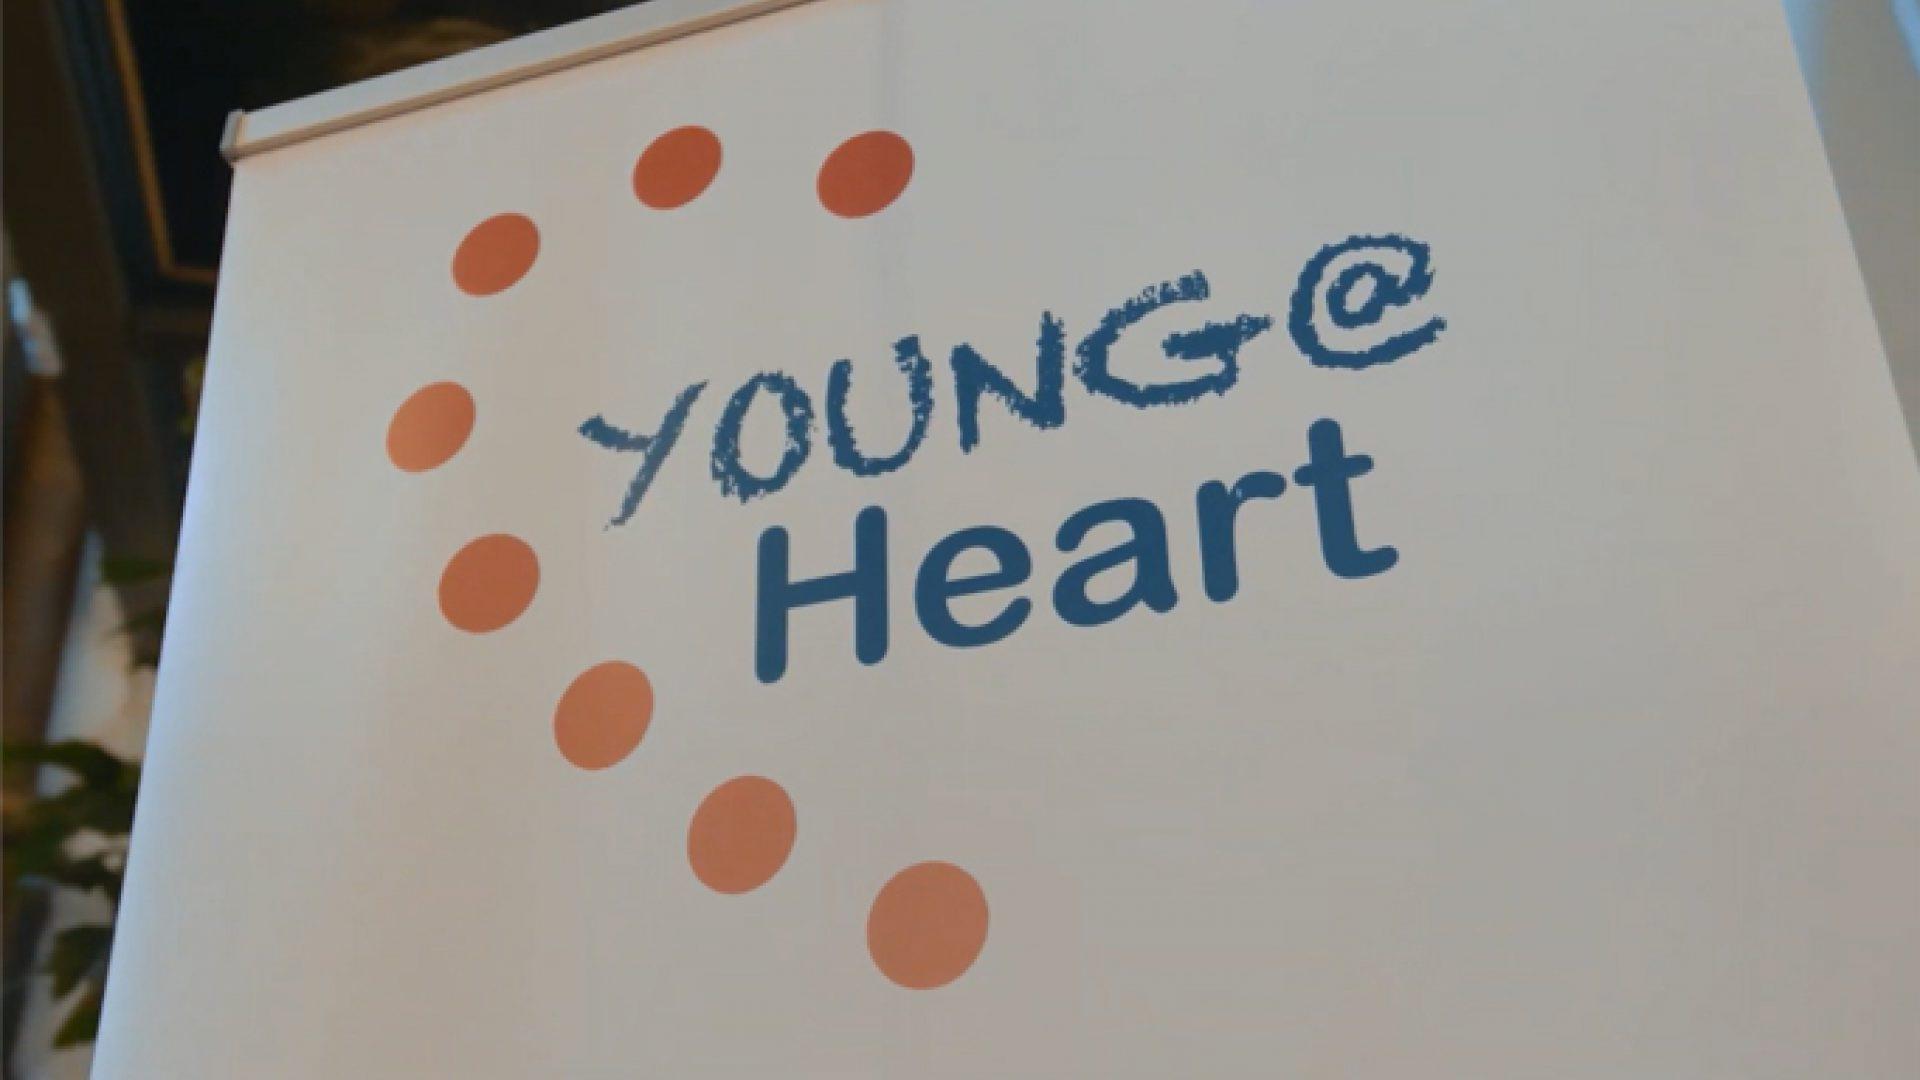 Youngatheart1